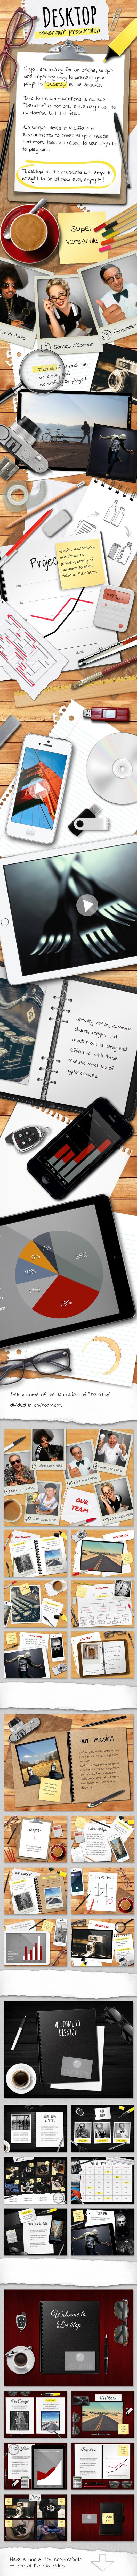 Desktop Powerpoint presentation - PowerPoint Templates Presentation Templates